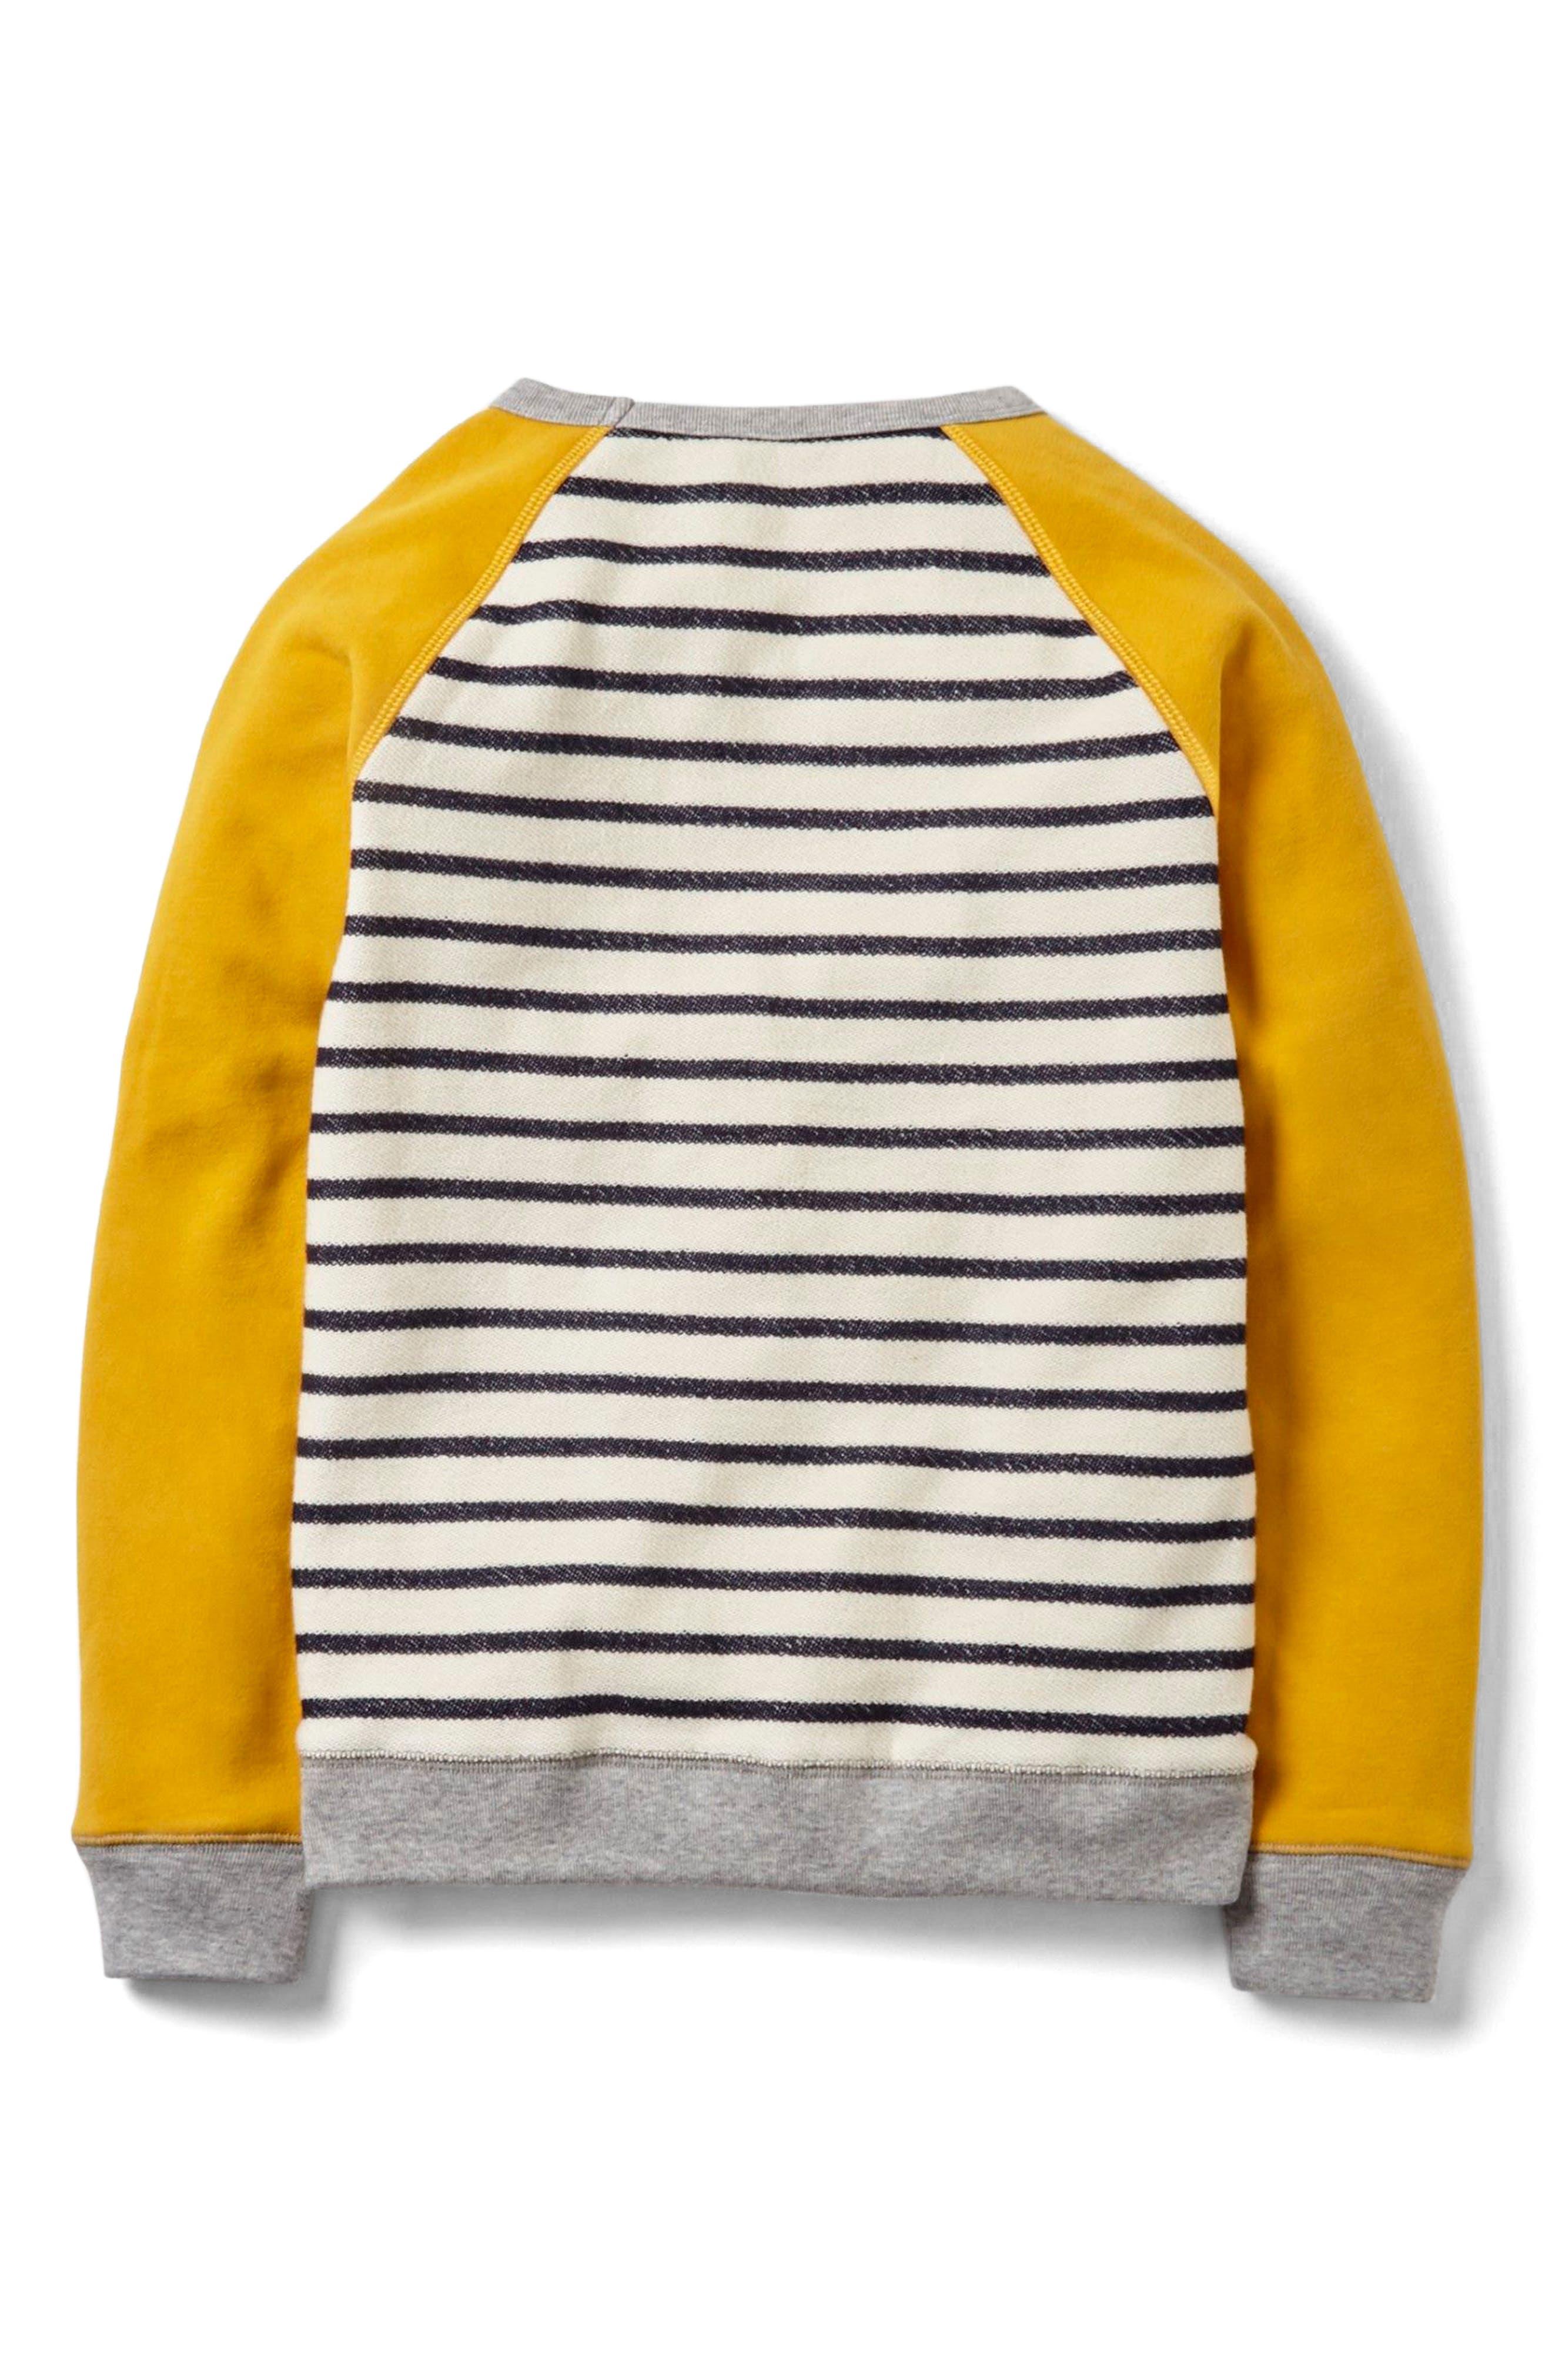 Alternate Image 2  - Mini Boden Essential Sweatshirt (Toddler Boys, Little Boys & Big Boys)